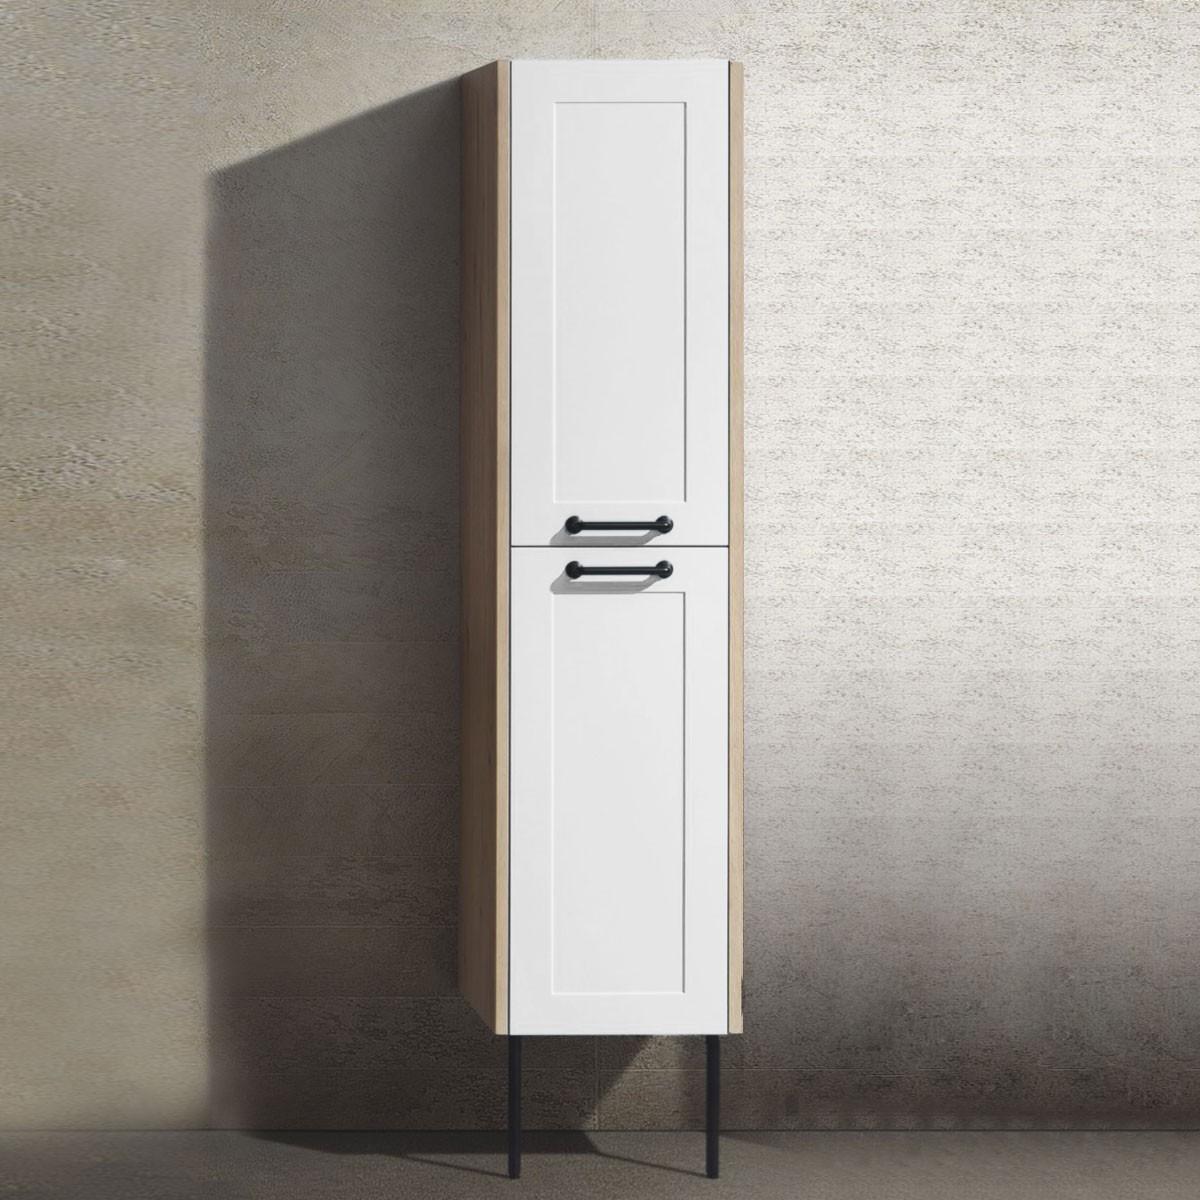 14 x 13 x 63 In. Wall Mount Bathroom Linen Cabinet (TP1002-S)